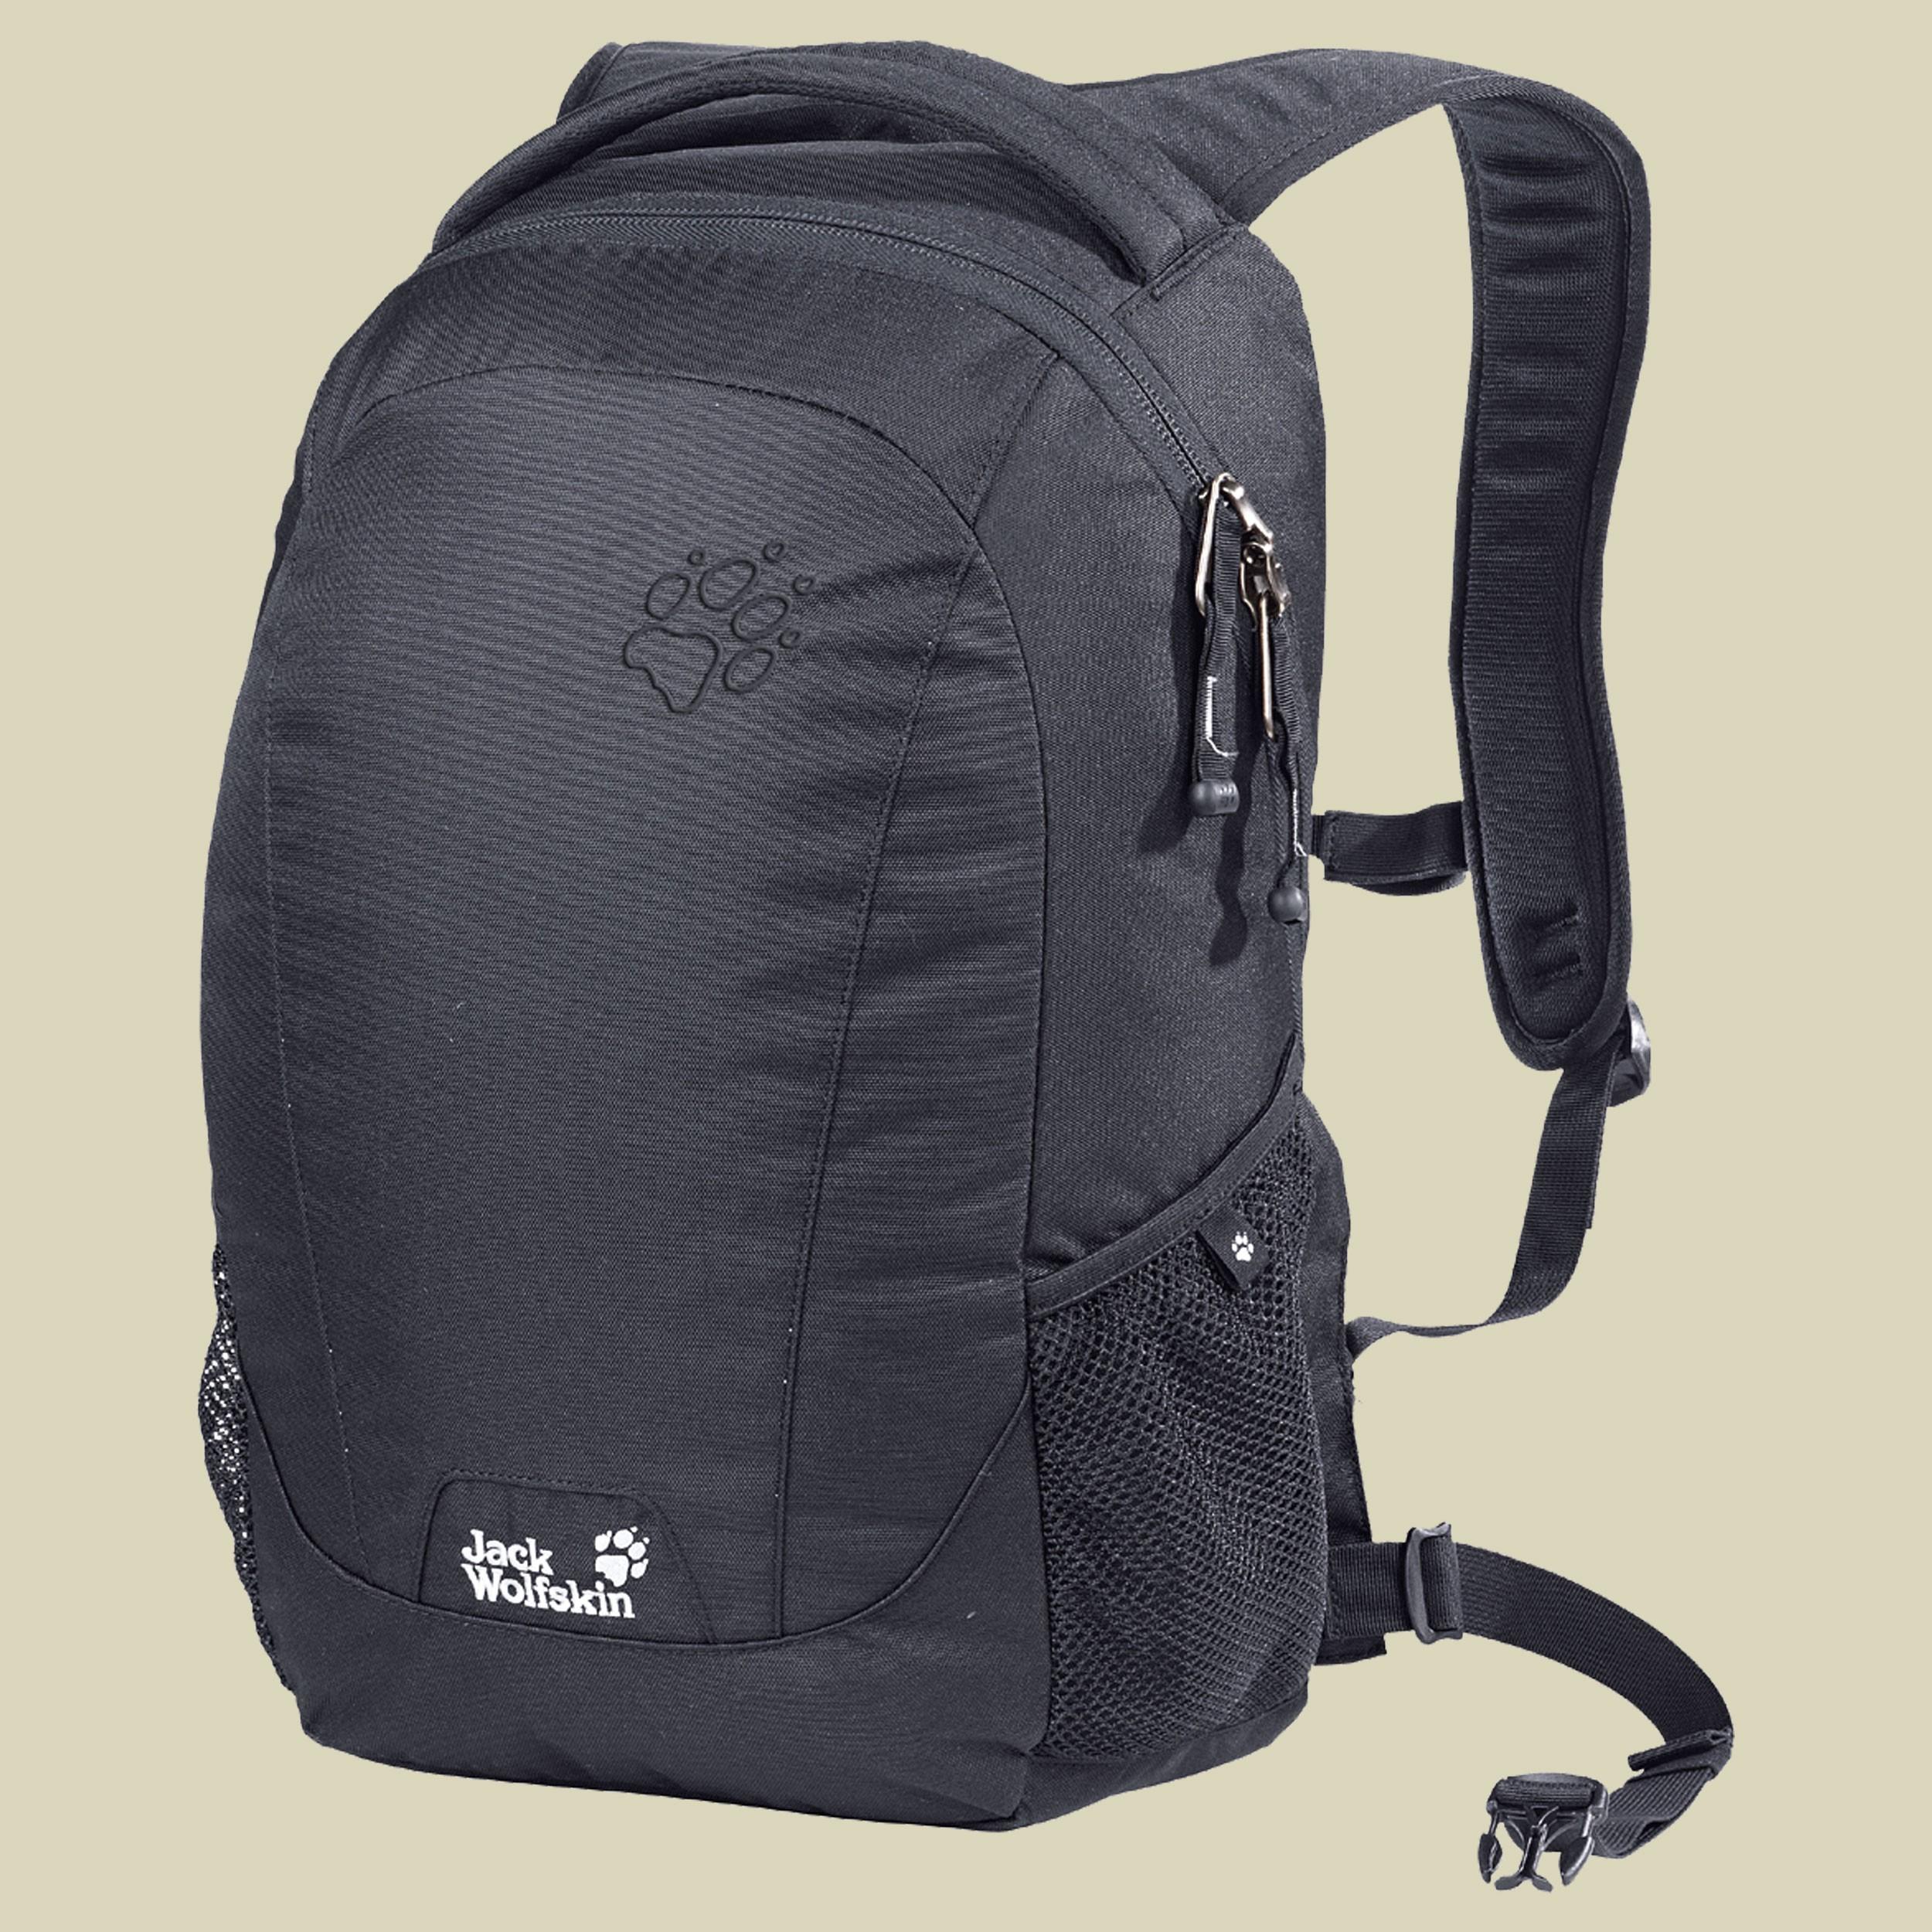 Incognito Pack